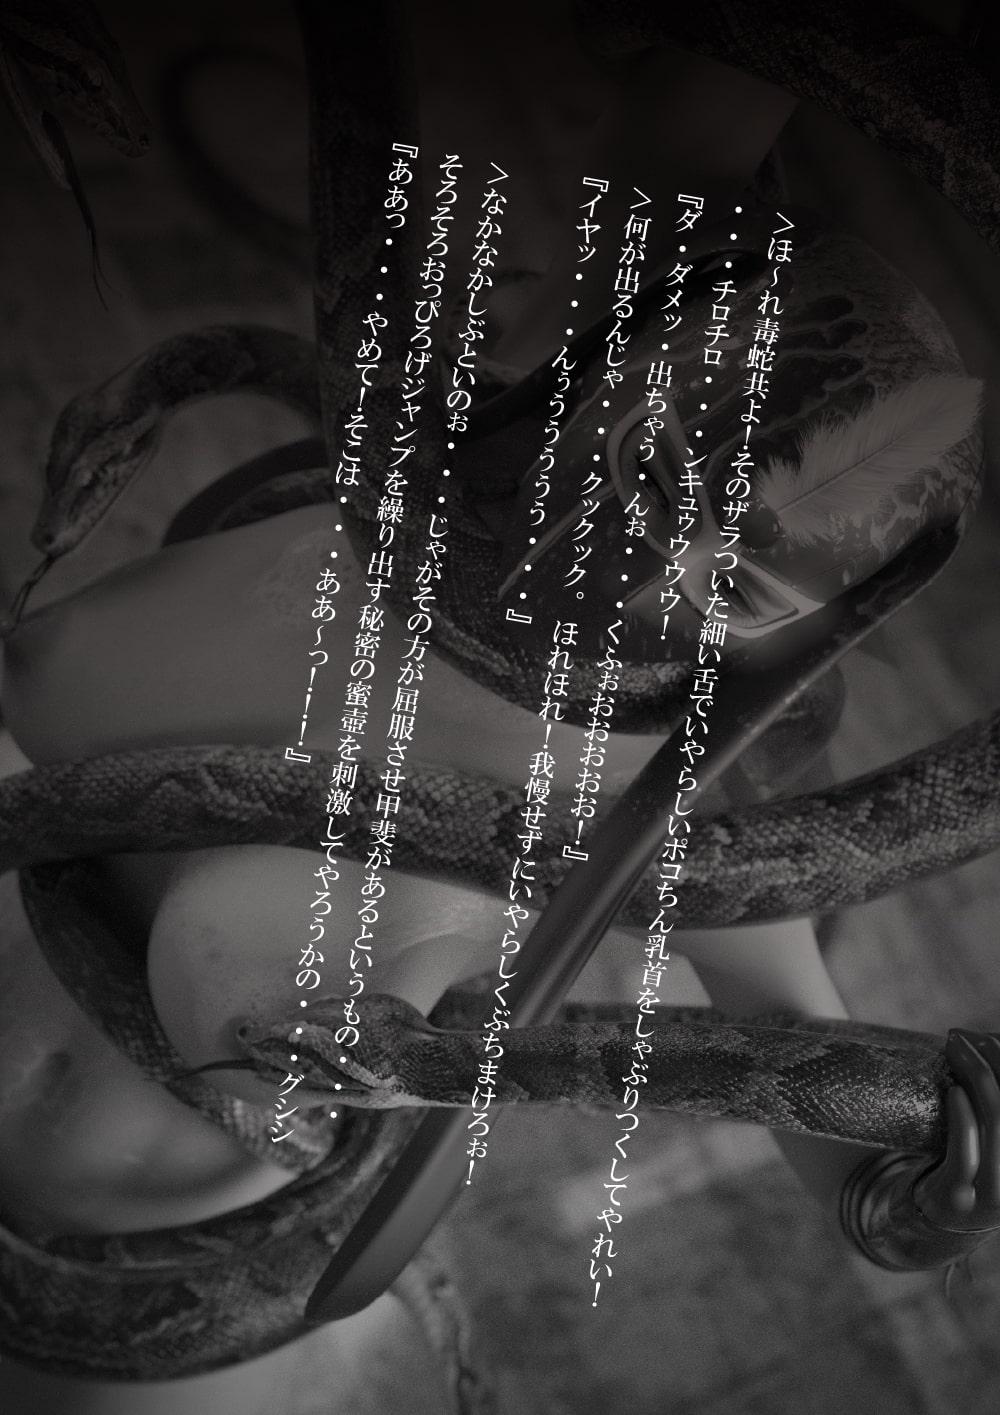 月刊結構仮面SPECIAL 007 女殺蛇地獄